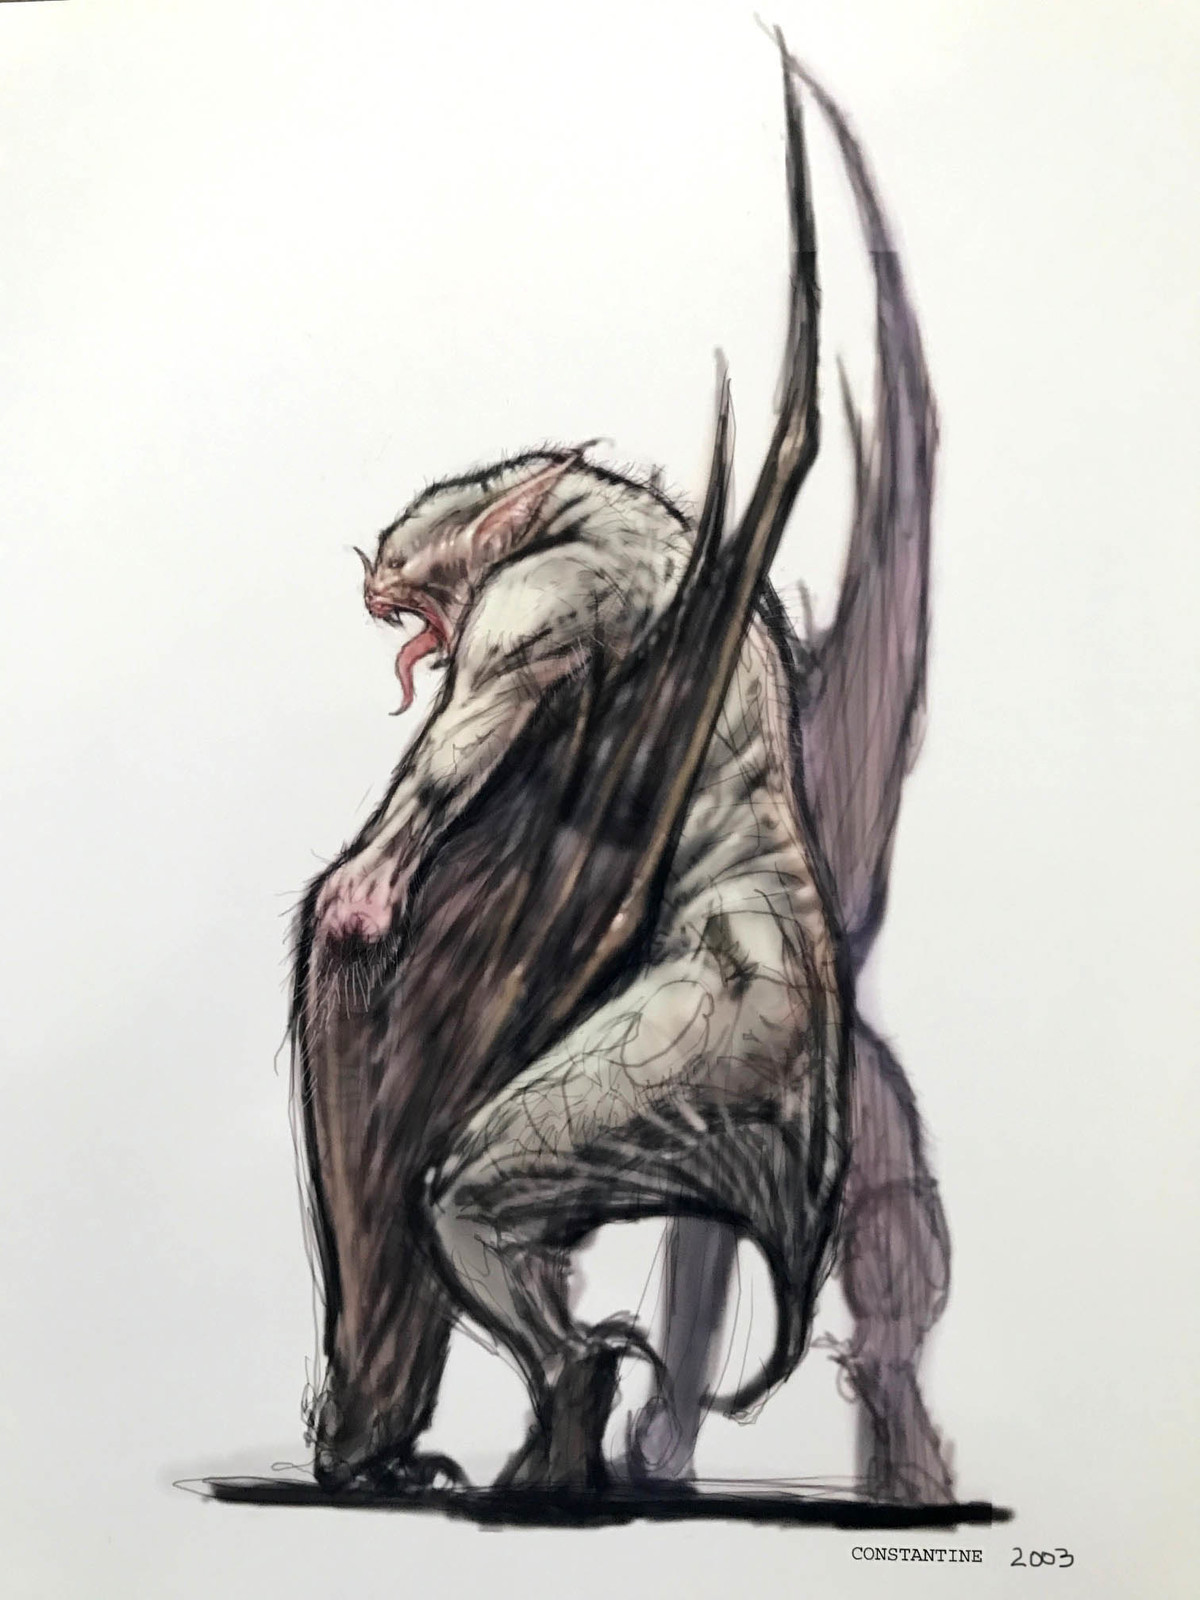 Bat creature van helsing